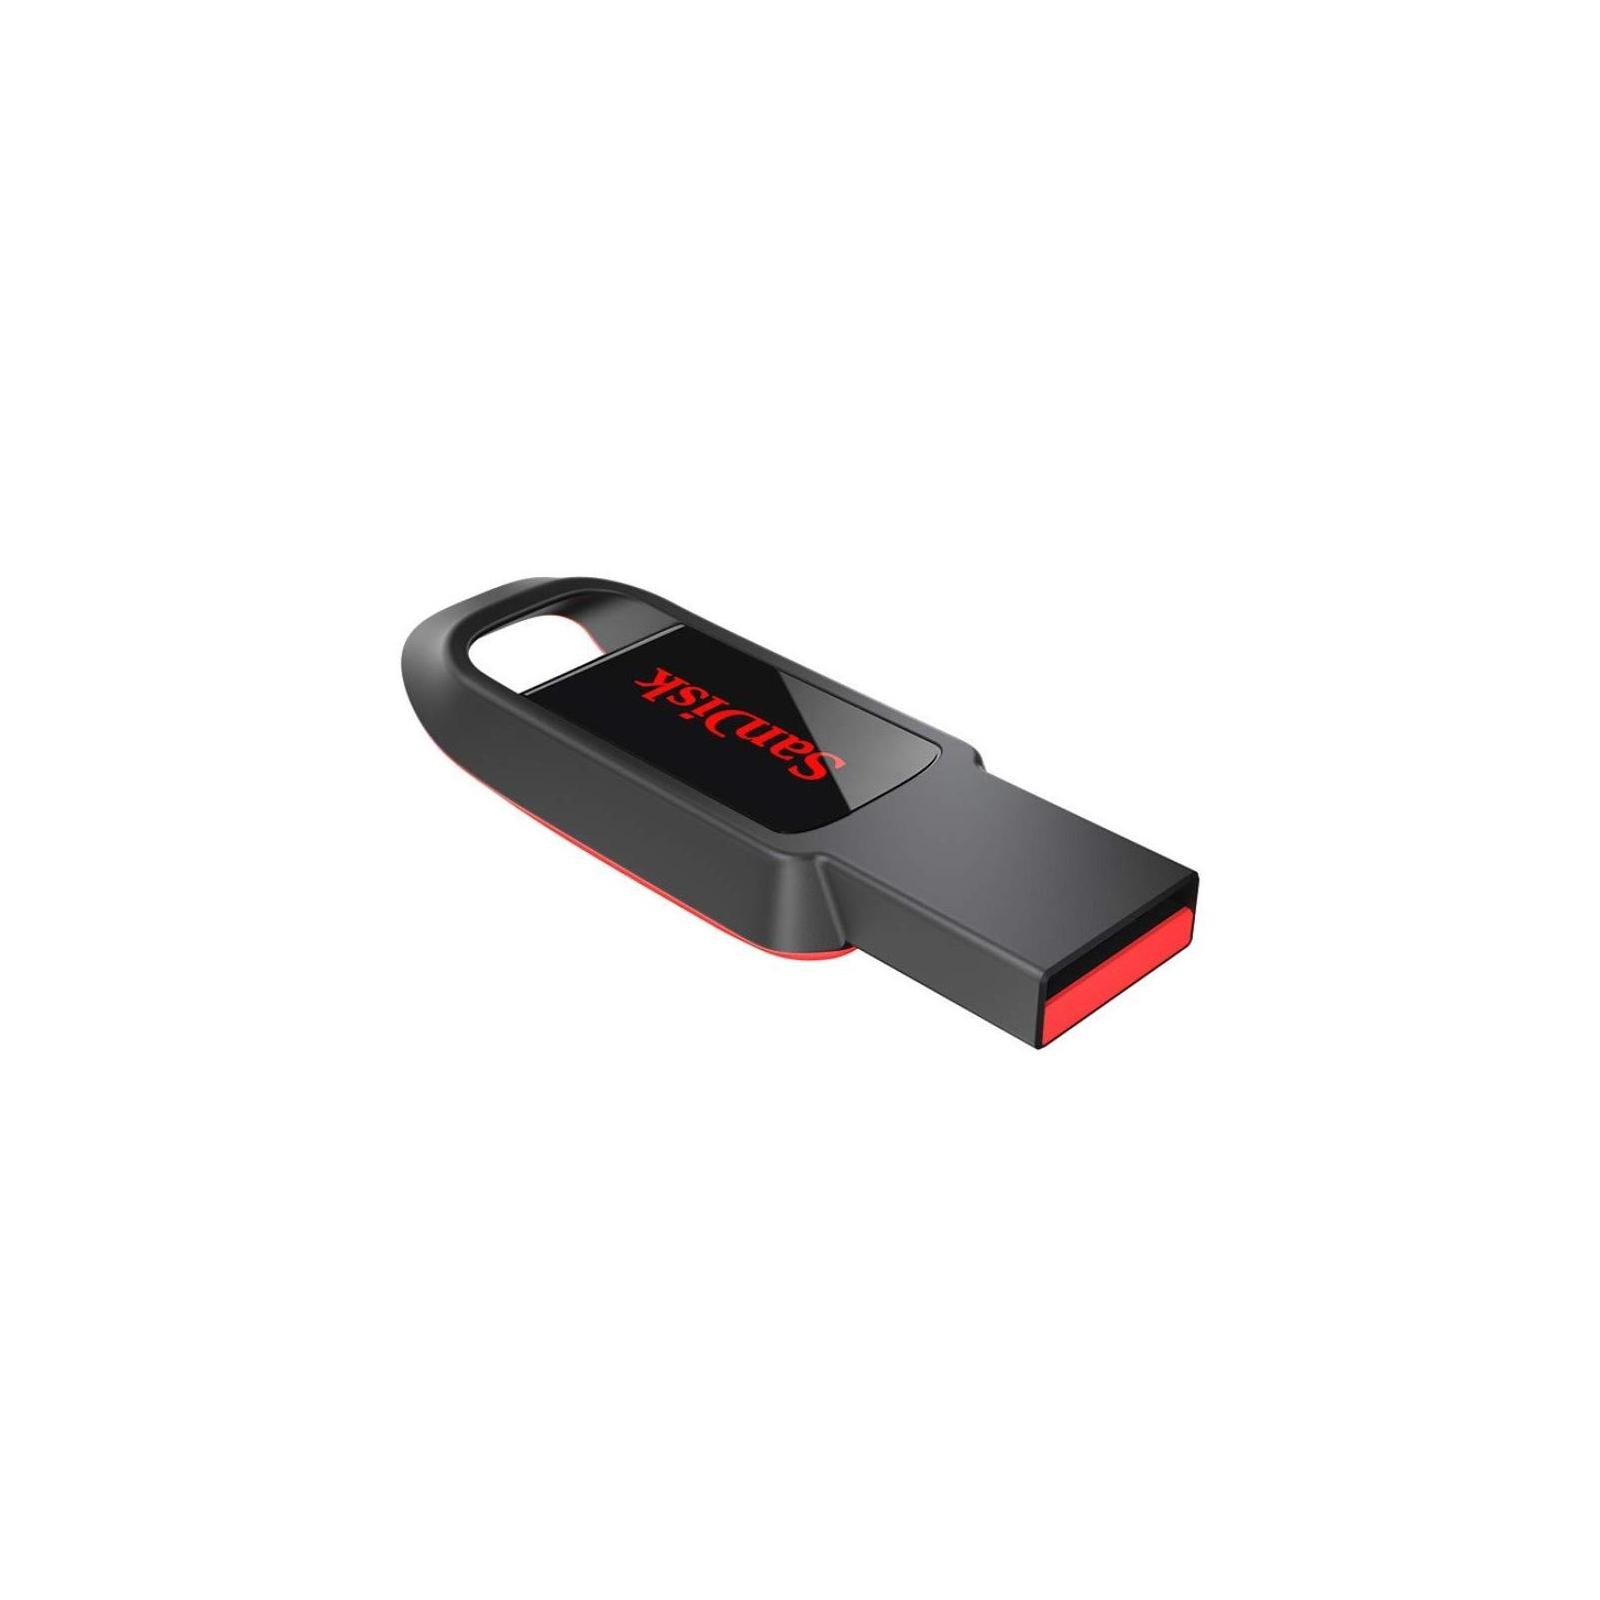 USB флеш накопитель SanDisk 16GB Cruzer Spark USB 2.0 (SDCZ61-016G-G35) изображение 3